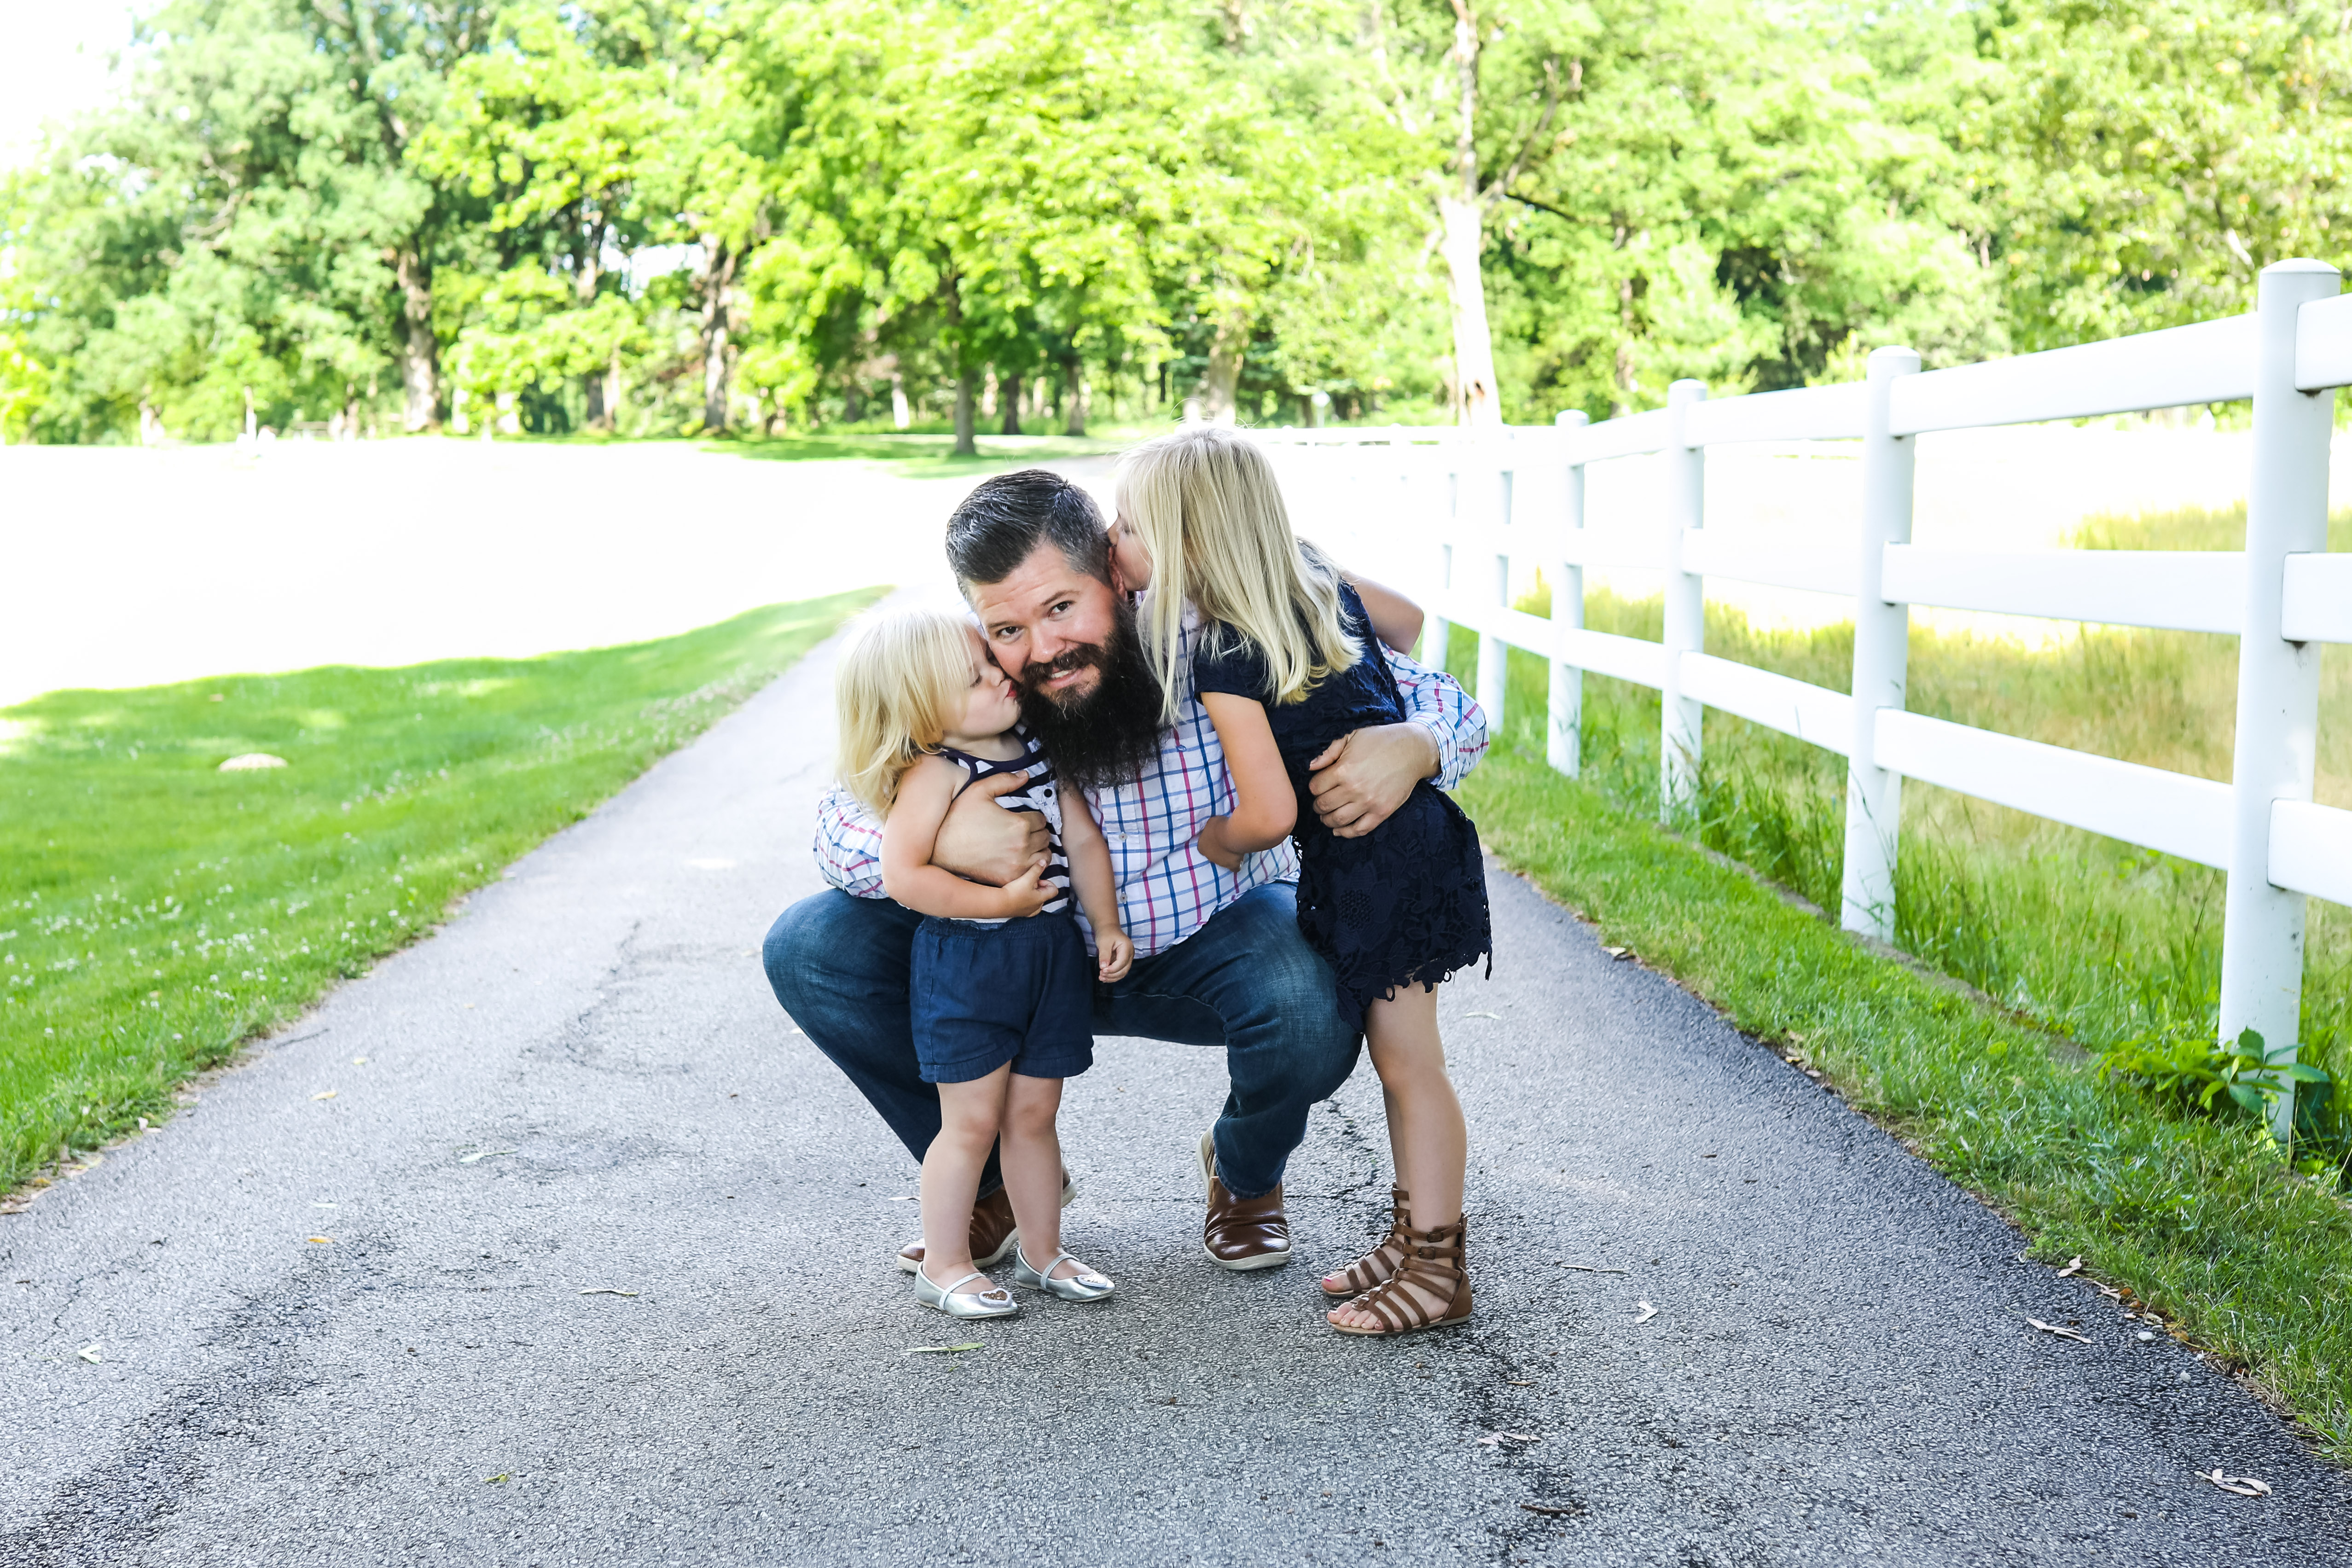 BecciHethcoatPhotography FamilyPhotographer Wheaton 20